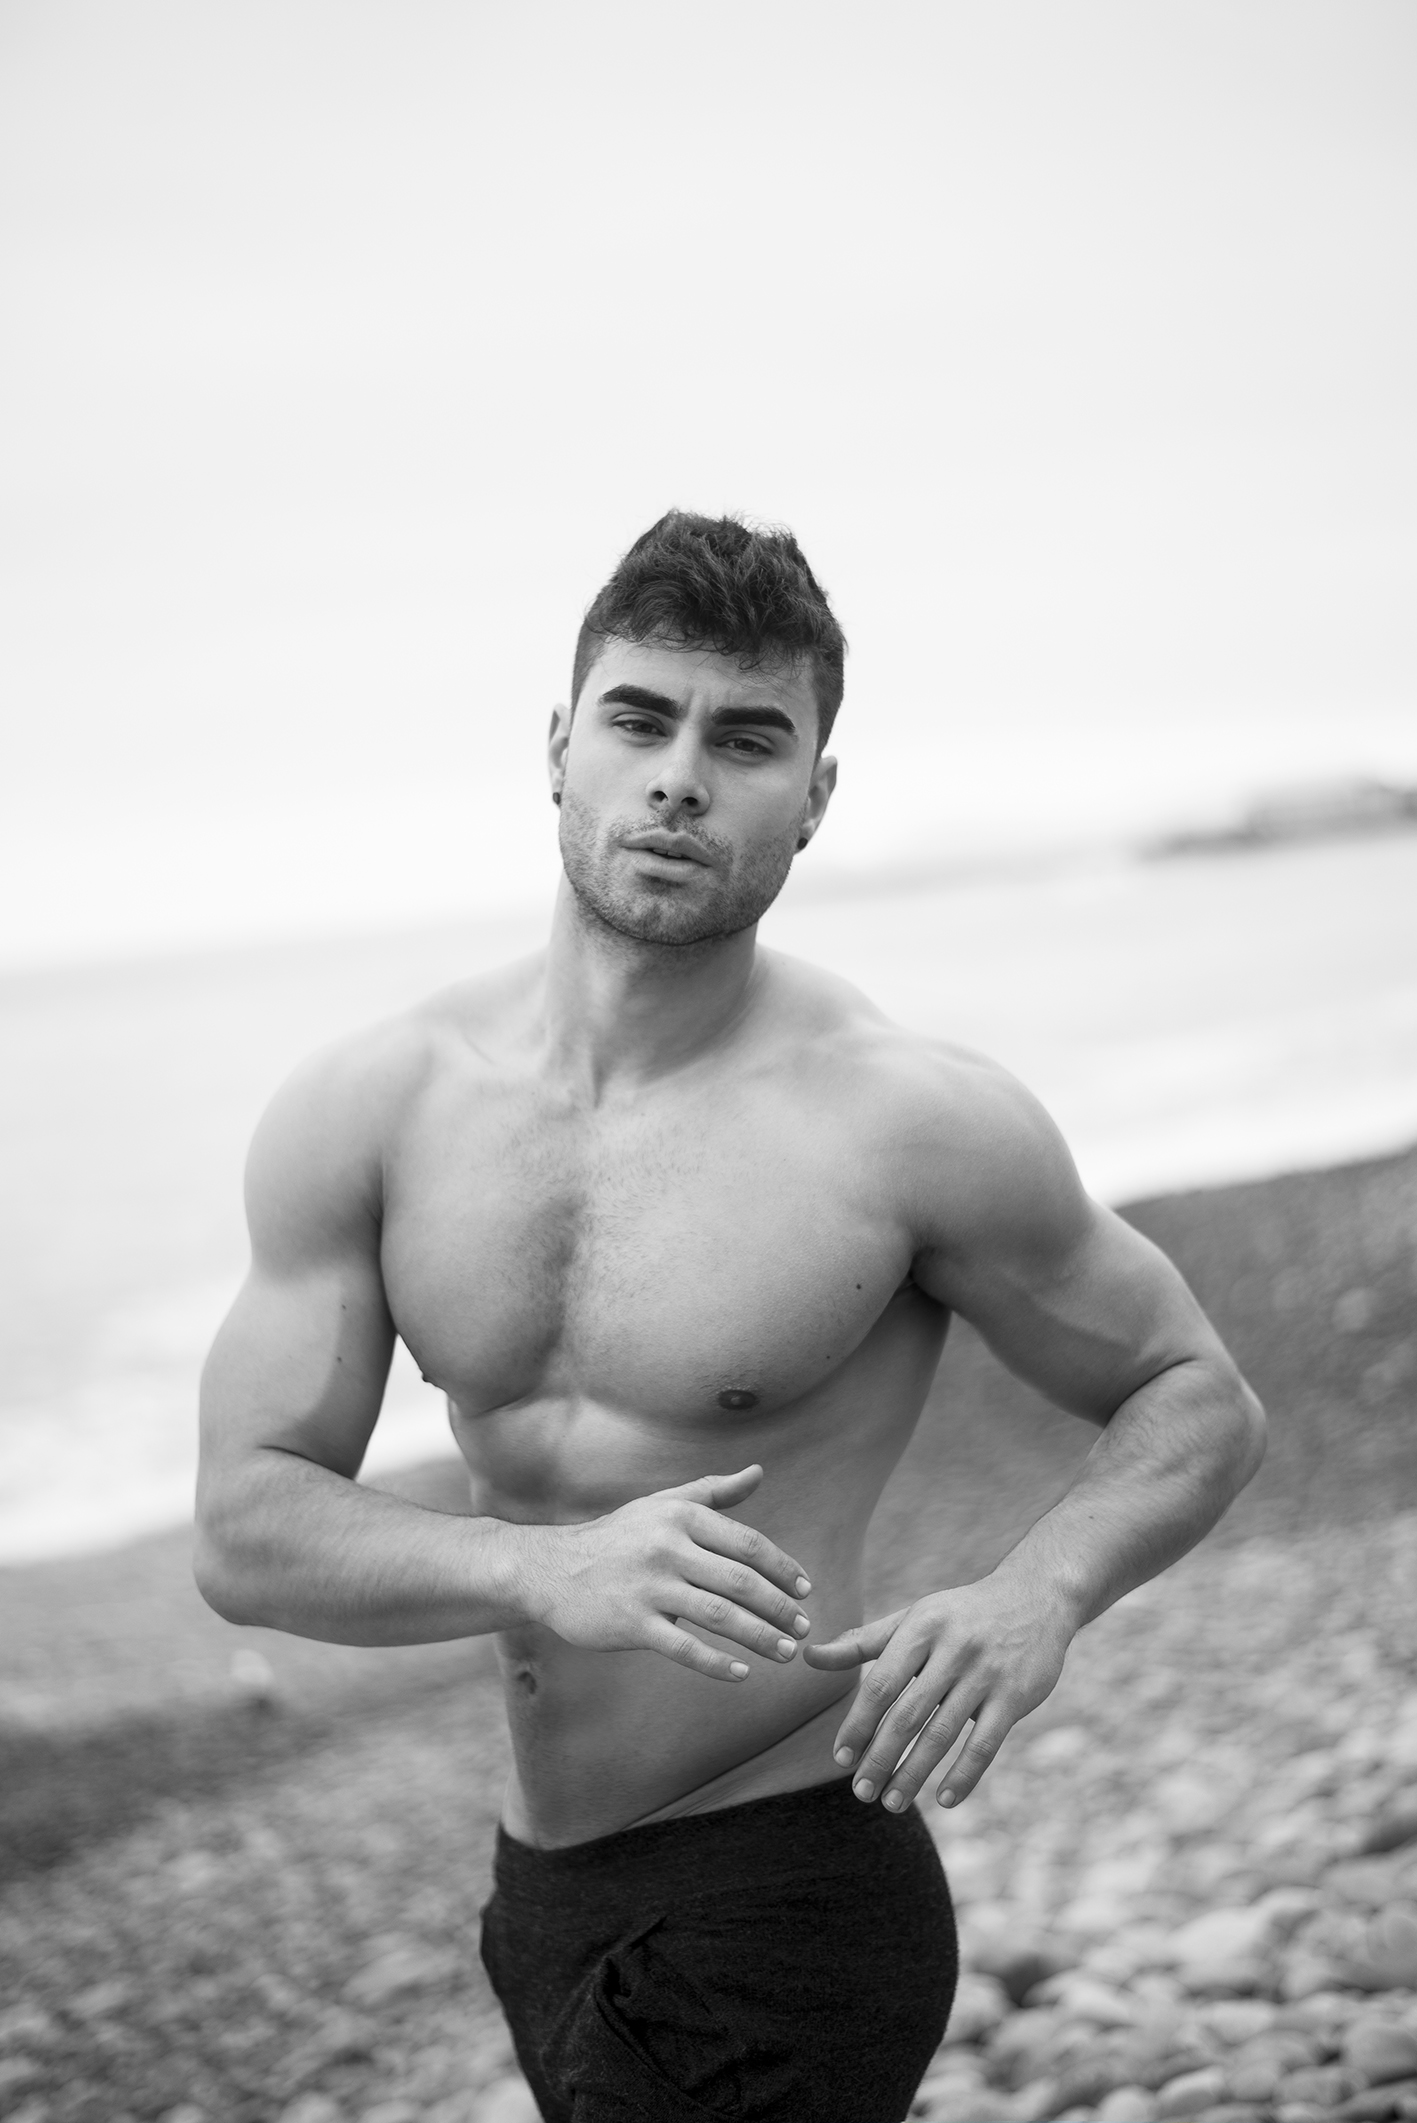 Alexi Descalzo Pam pa las mujeres Modelo Model male man sexy hot Summer Body Winter -007.jpg